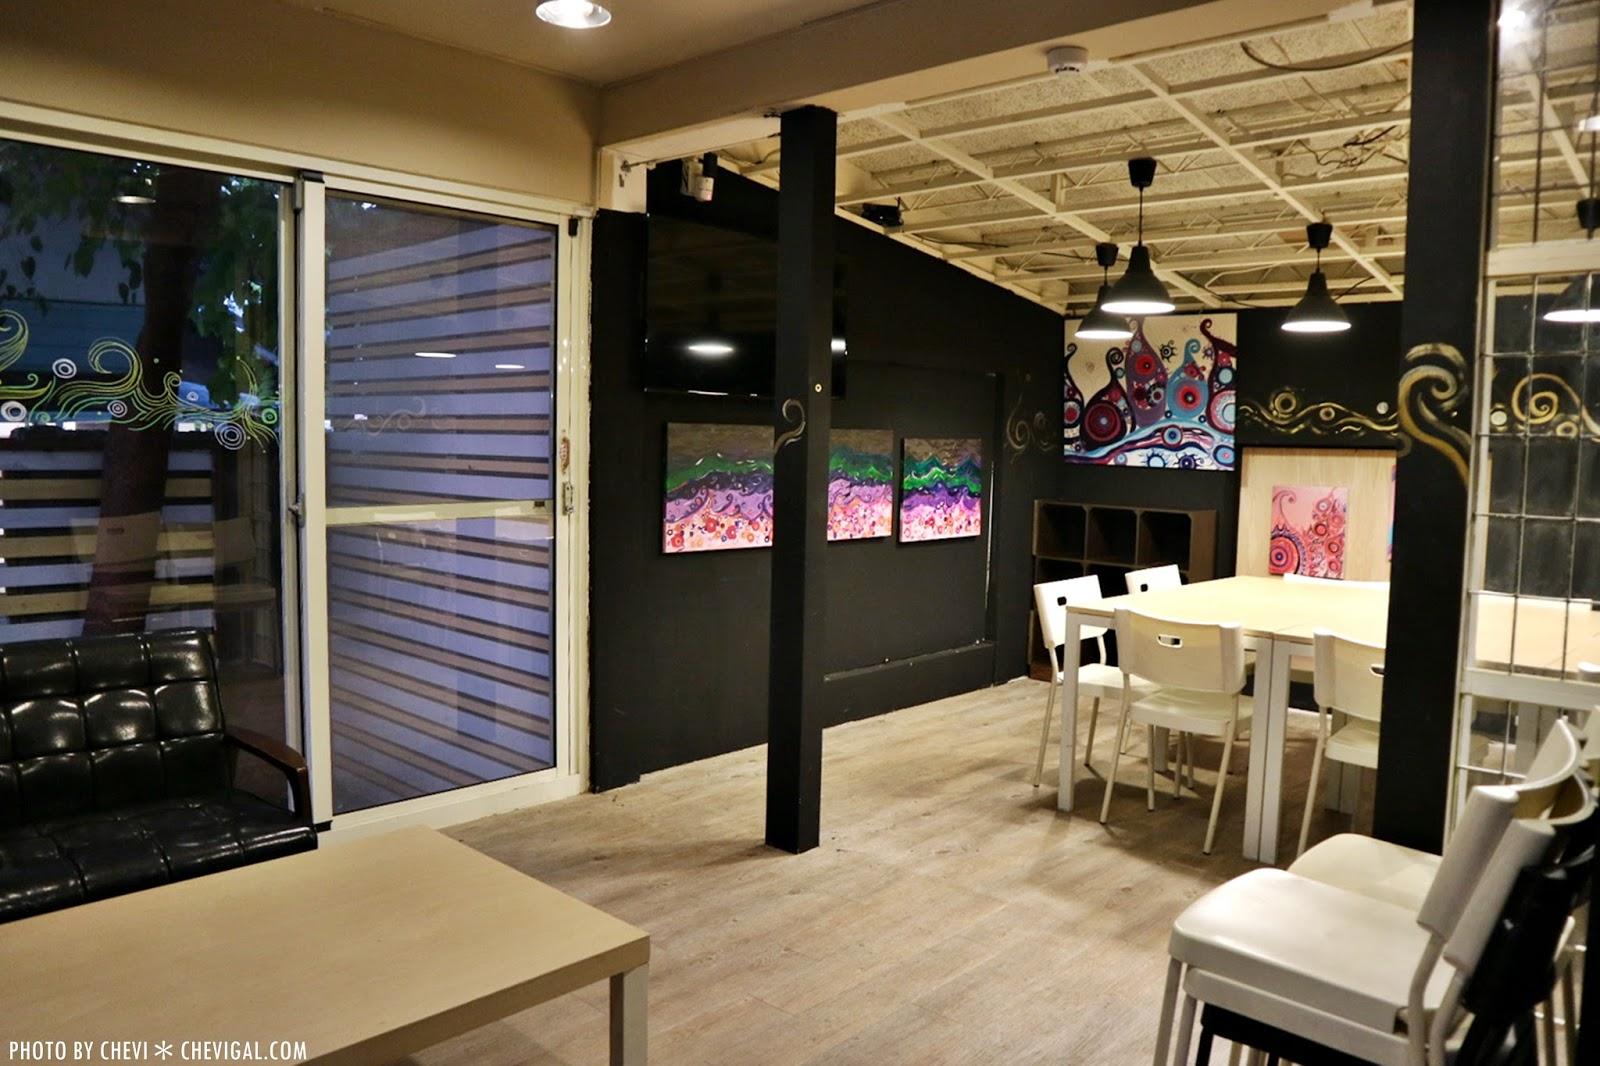 image214 - 熱血採訪│大和17。日式建築的運動主題餐館。自在氣氛包場好地方。臺虎精釀也能喝得到 (已歇業)